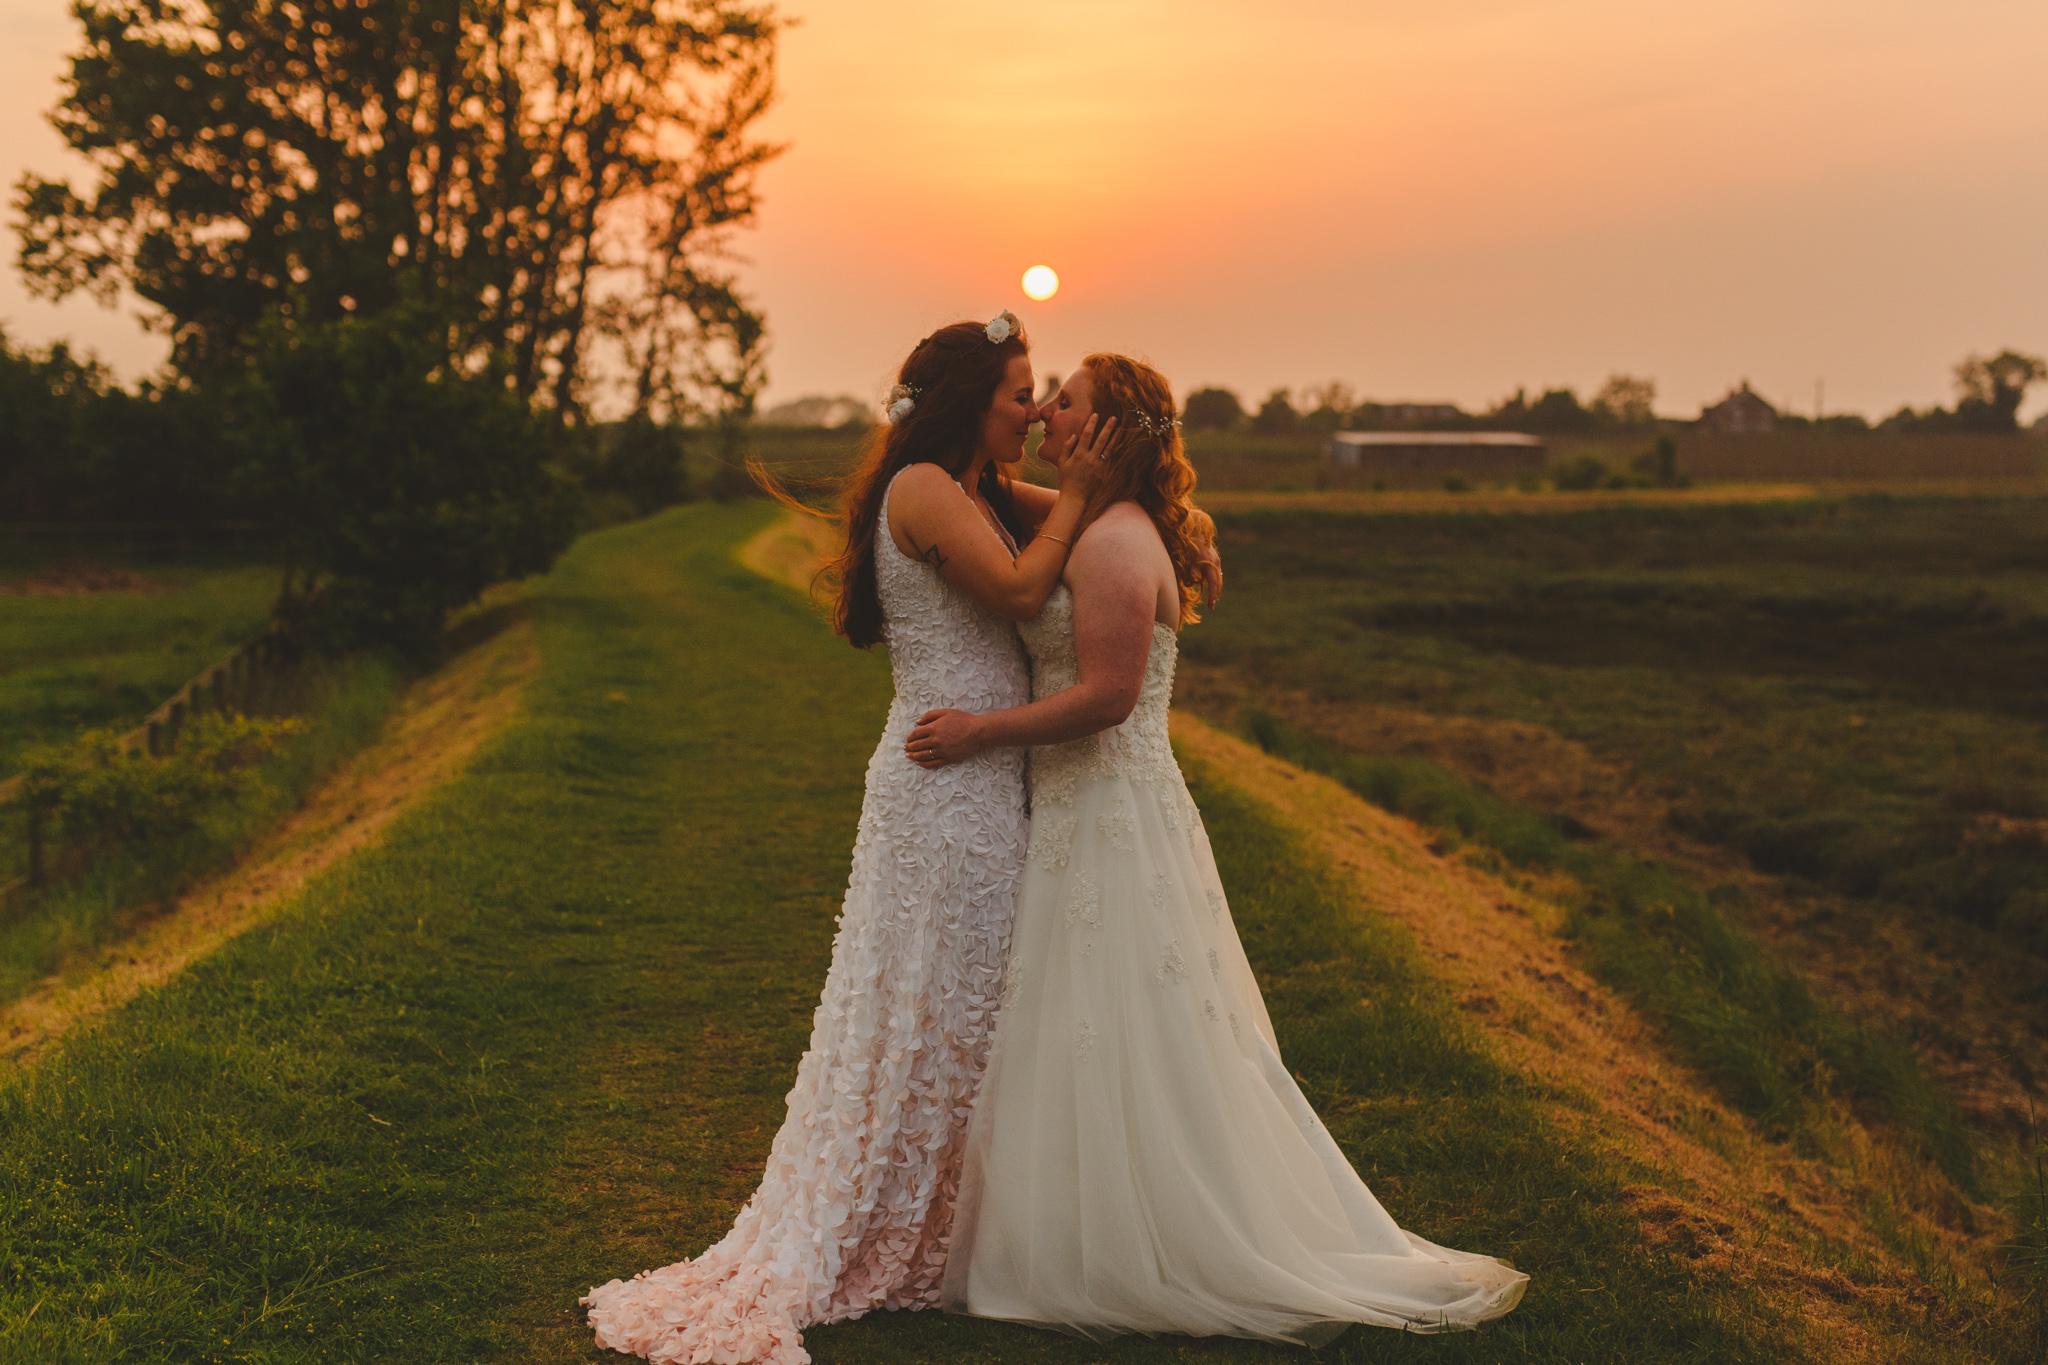 derbyshire-wedding-photographer-videographer-camera-hannah-64.jpg